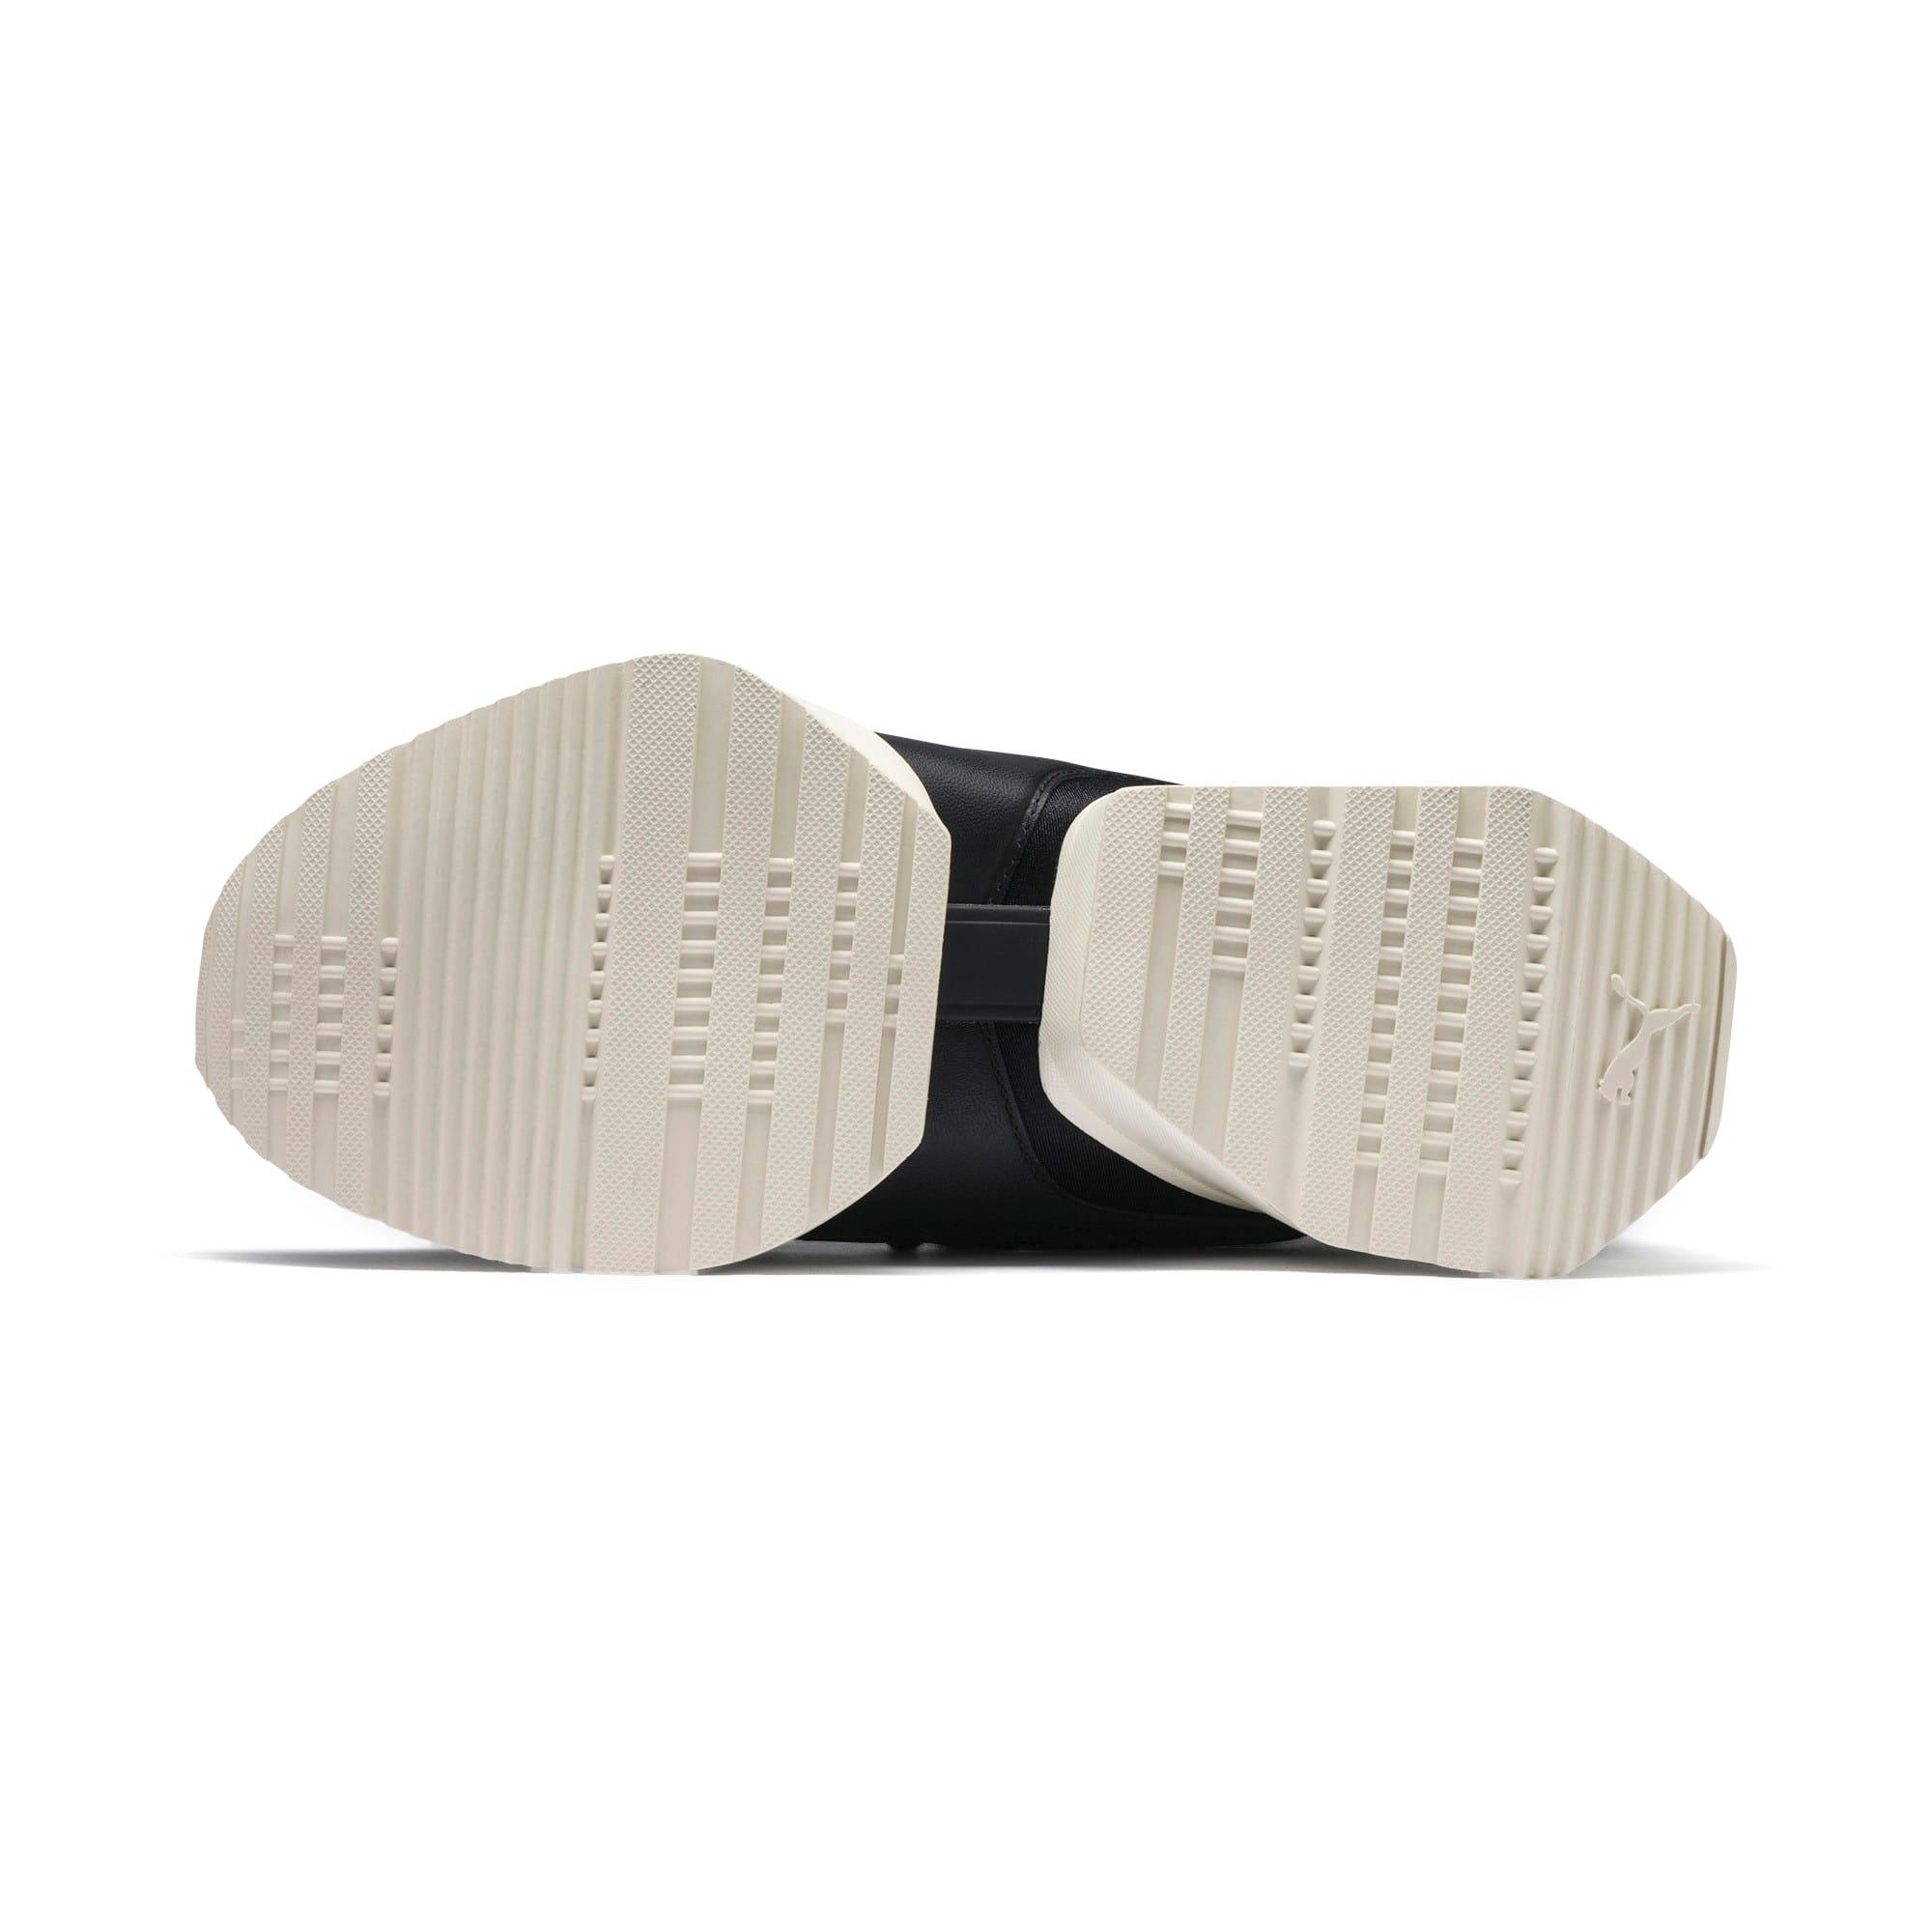 Thumbnail 5 of Muse Maia Knit Premium Damen Sneaker, Puma Black-Whisper White, medium